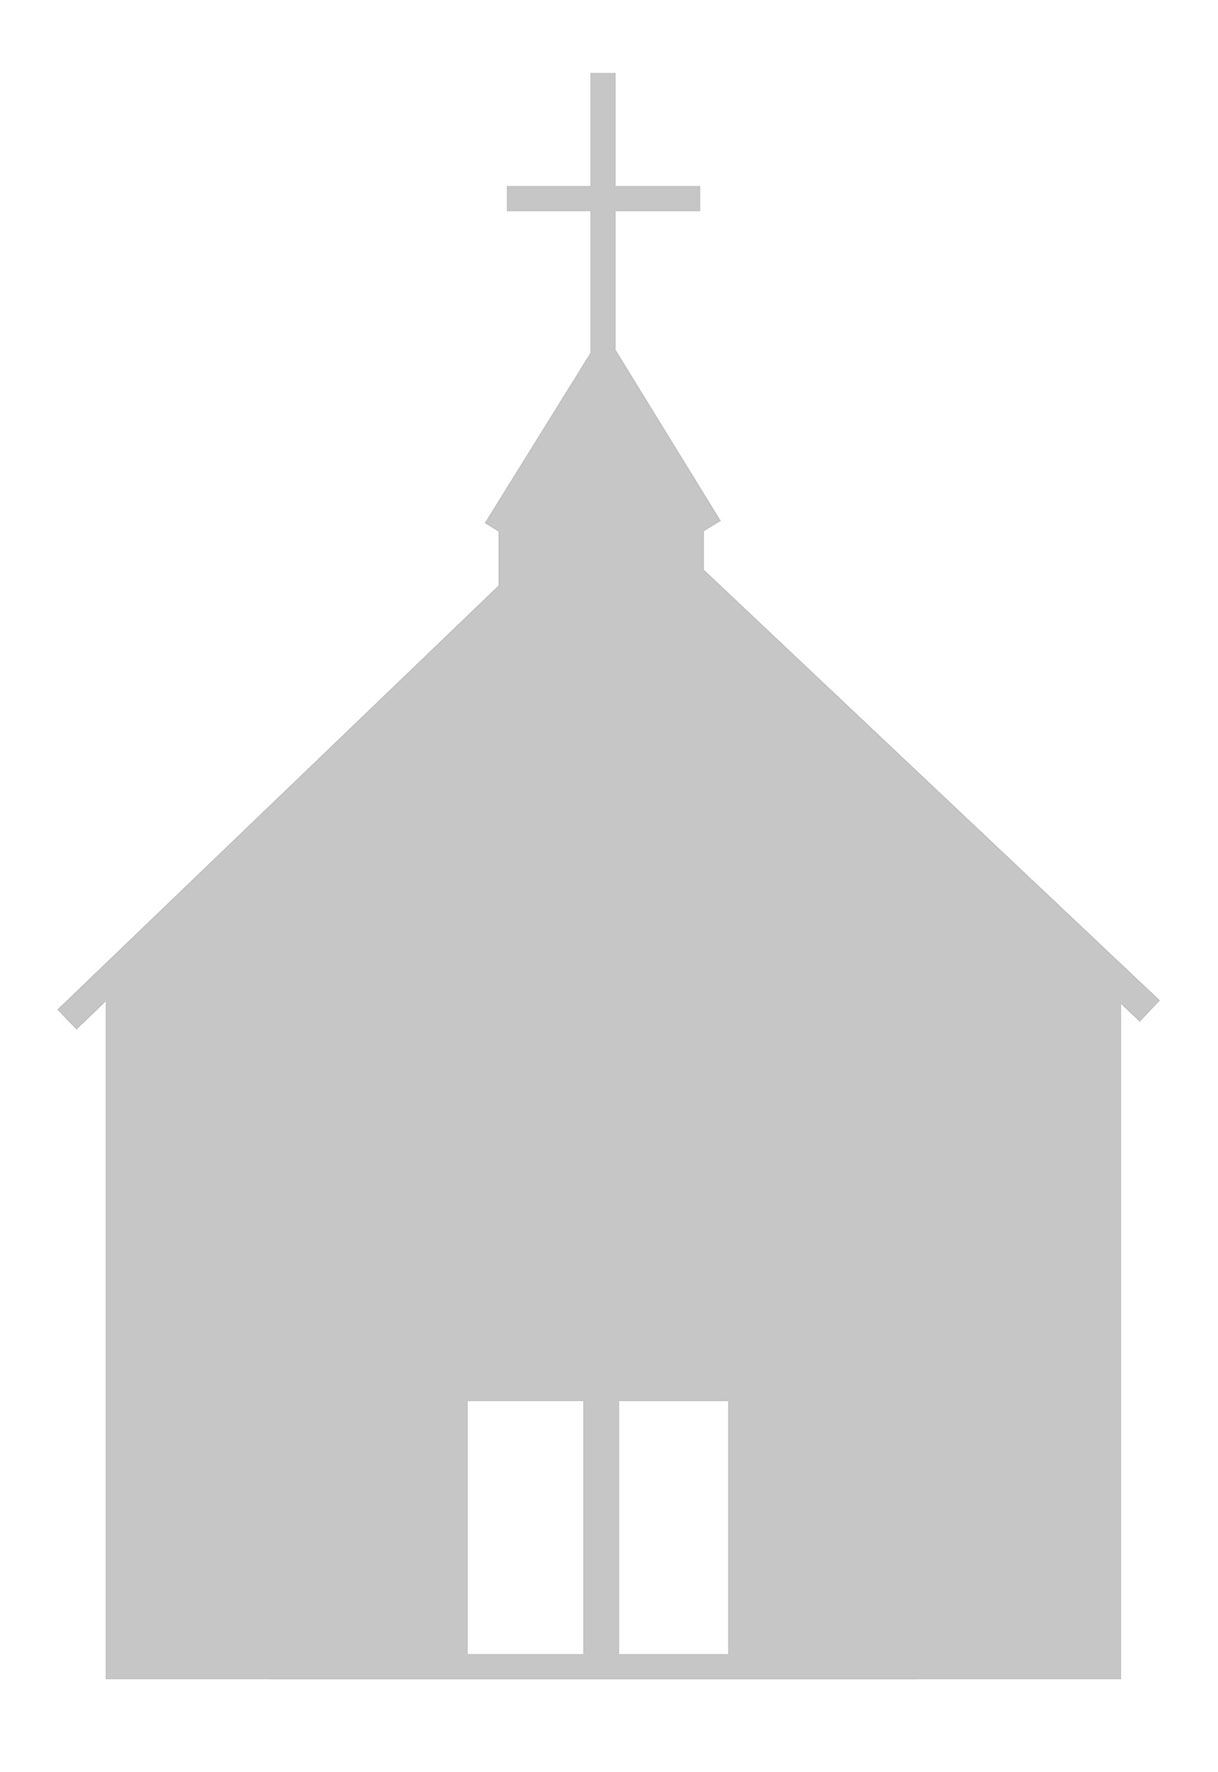 Luciagudstjänst i S:a Möckleby kyrka